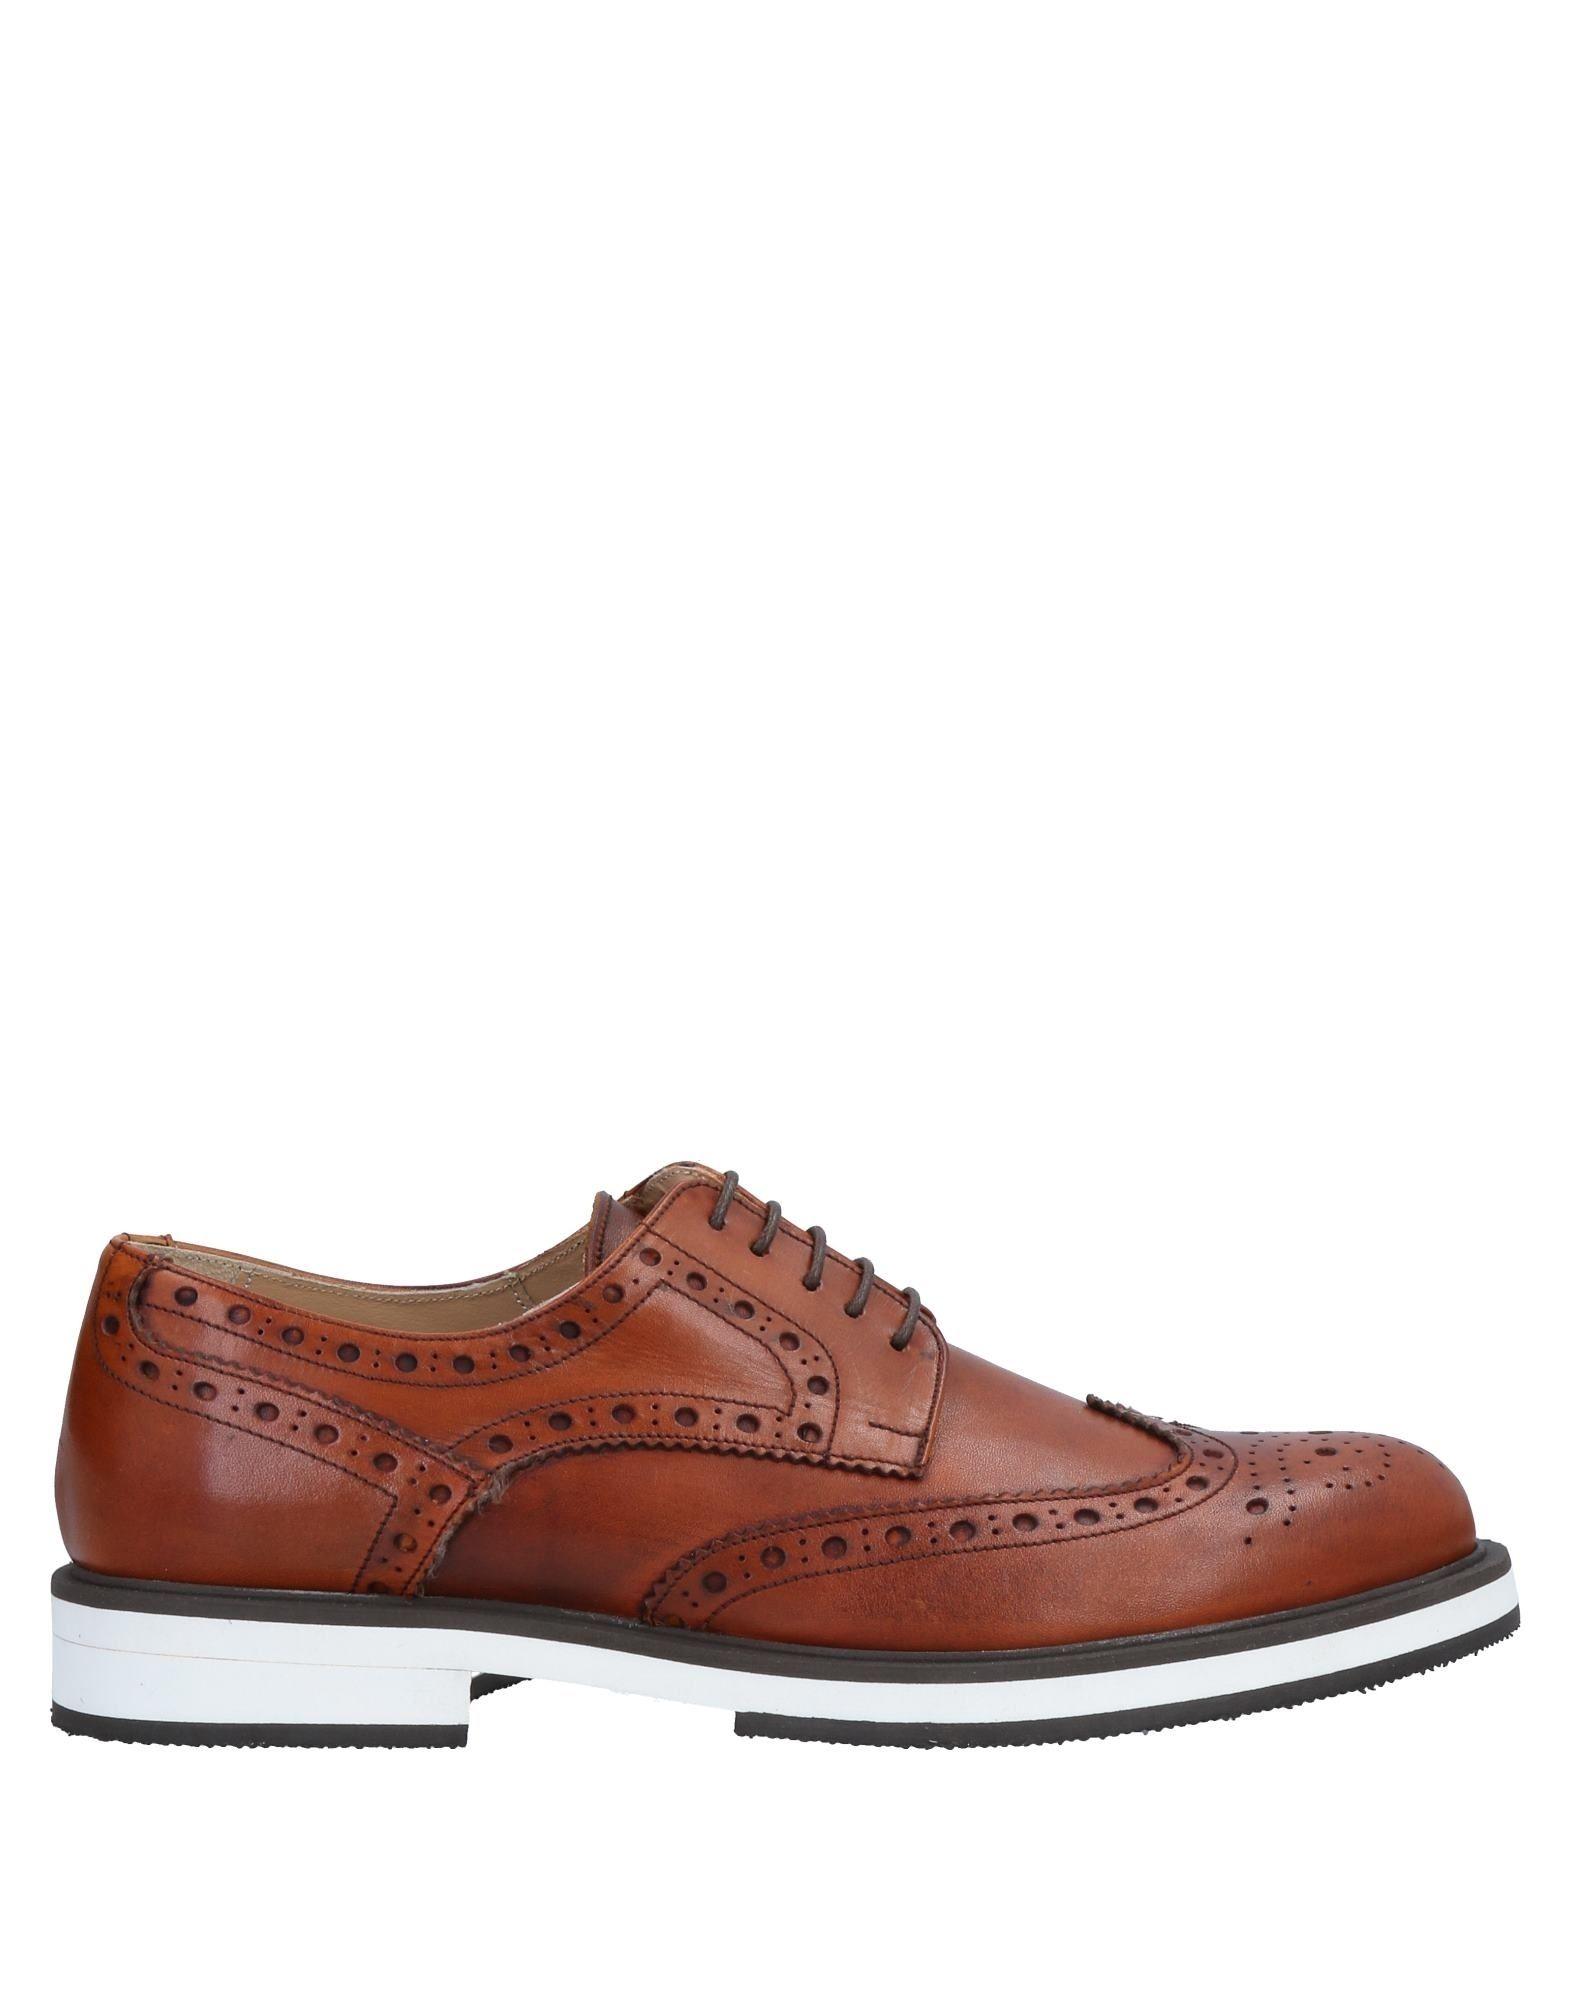 Фото - ANGELO PALLOTTA Обувь на шнурках обувь на высокой платформе dkny